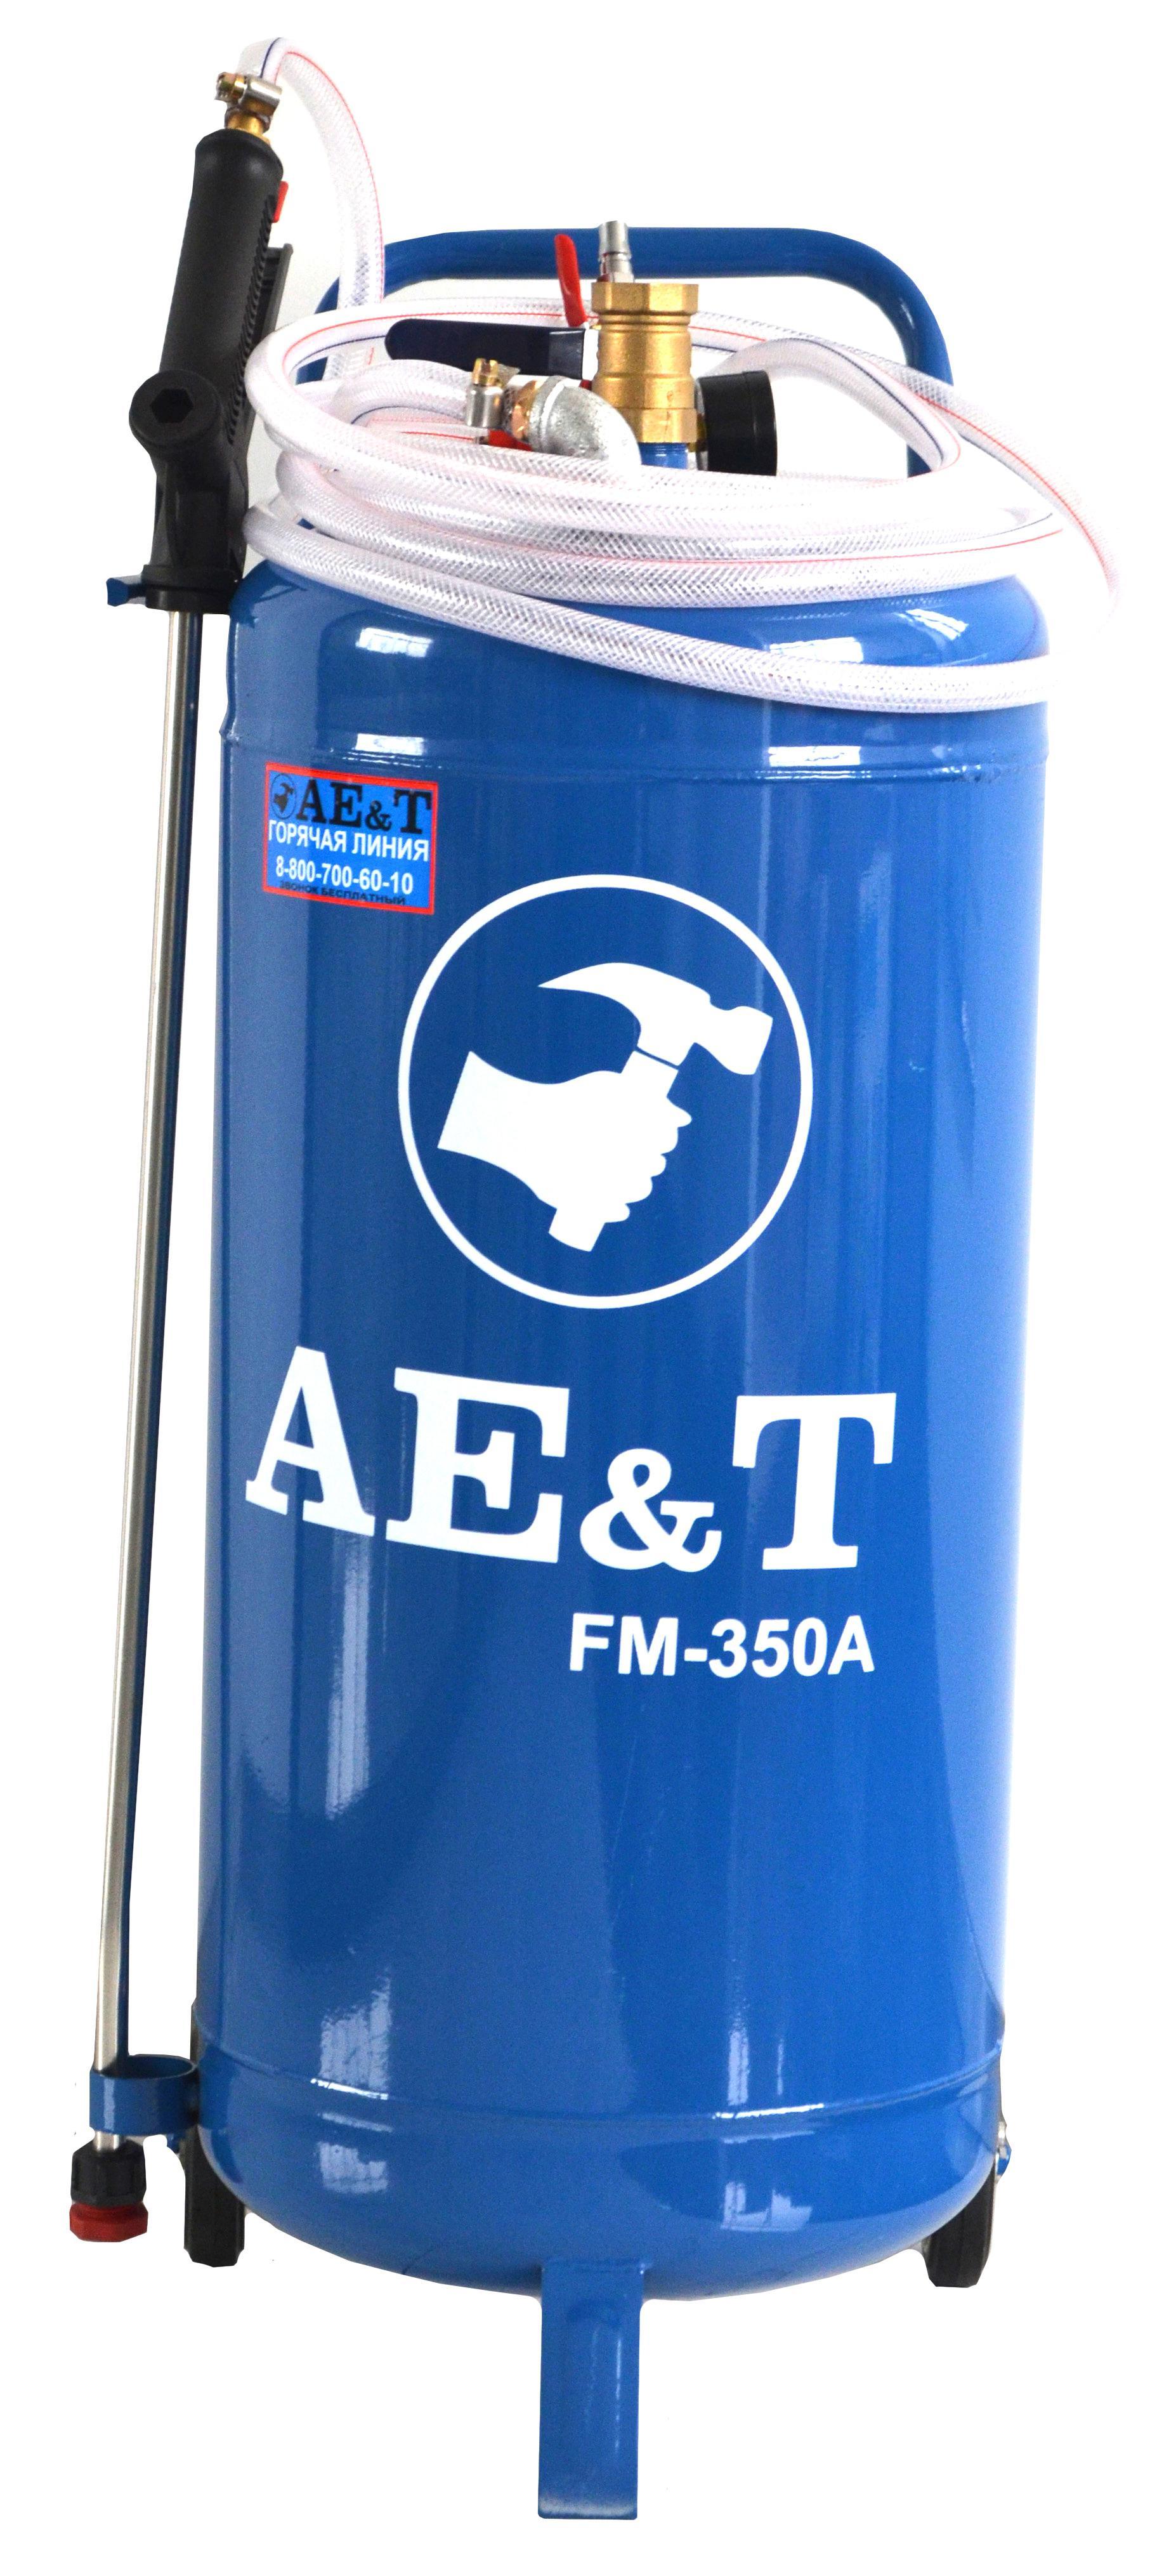 Пеногенератор Ae&t Fm-350a